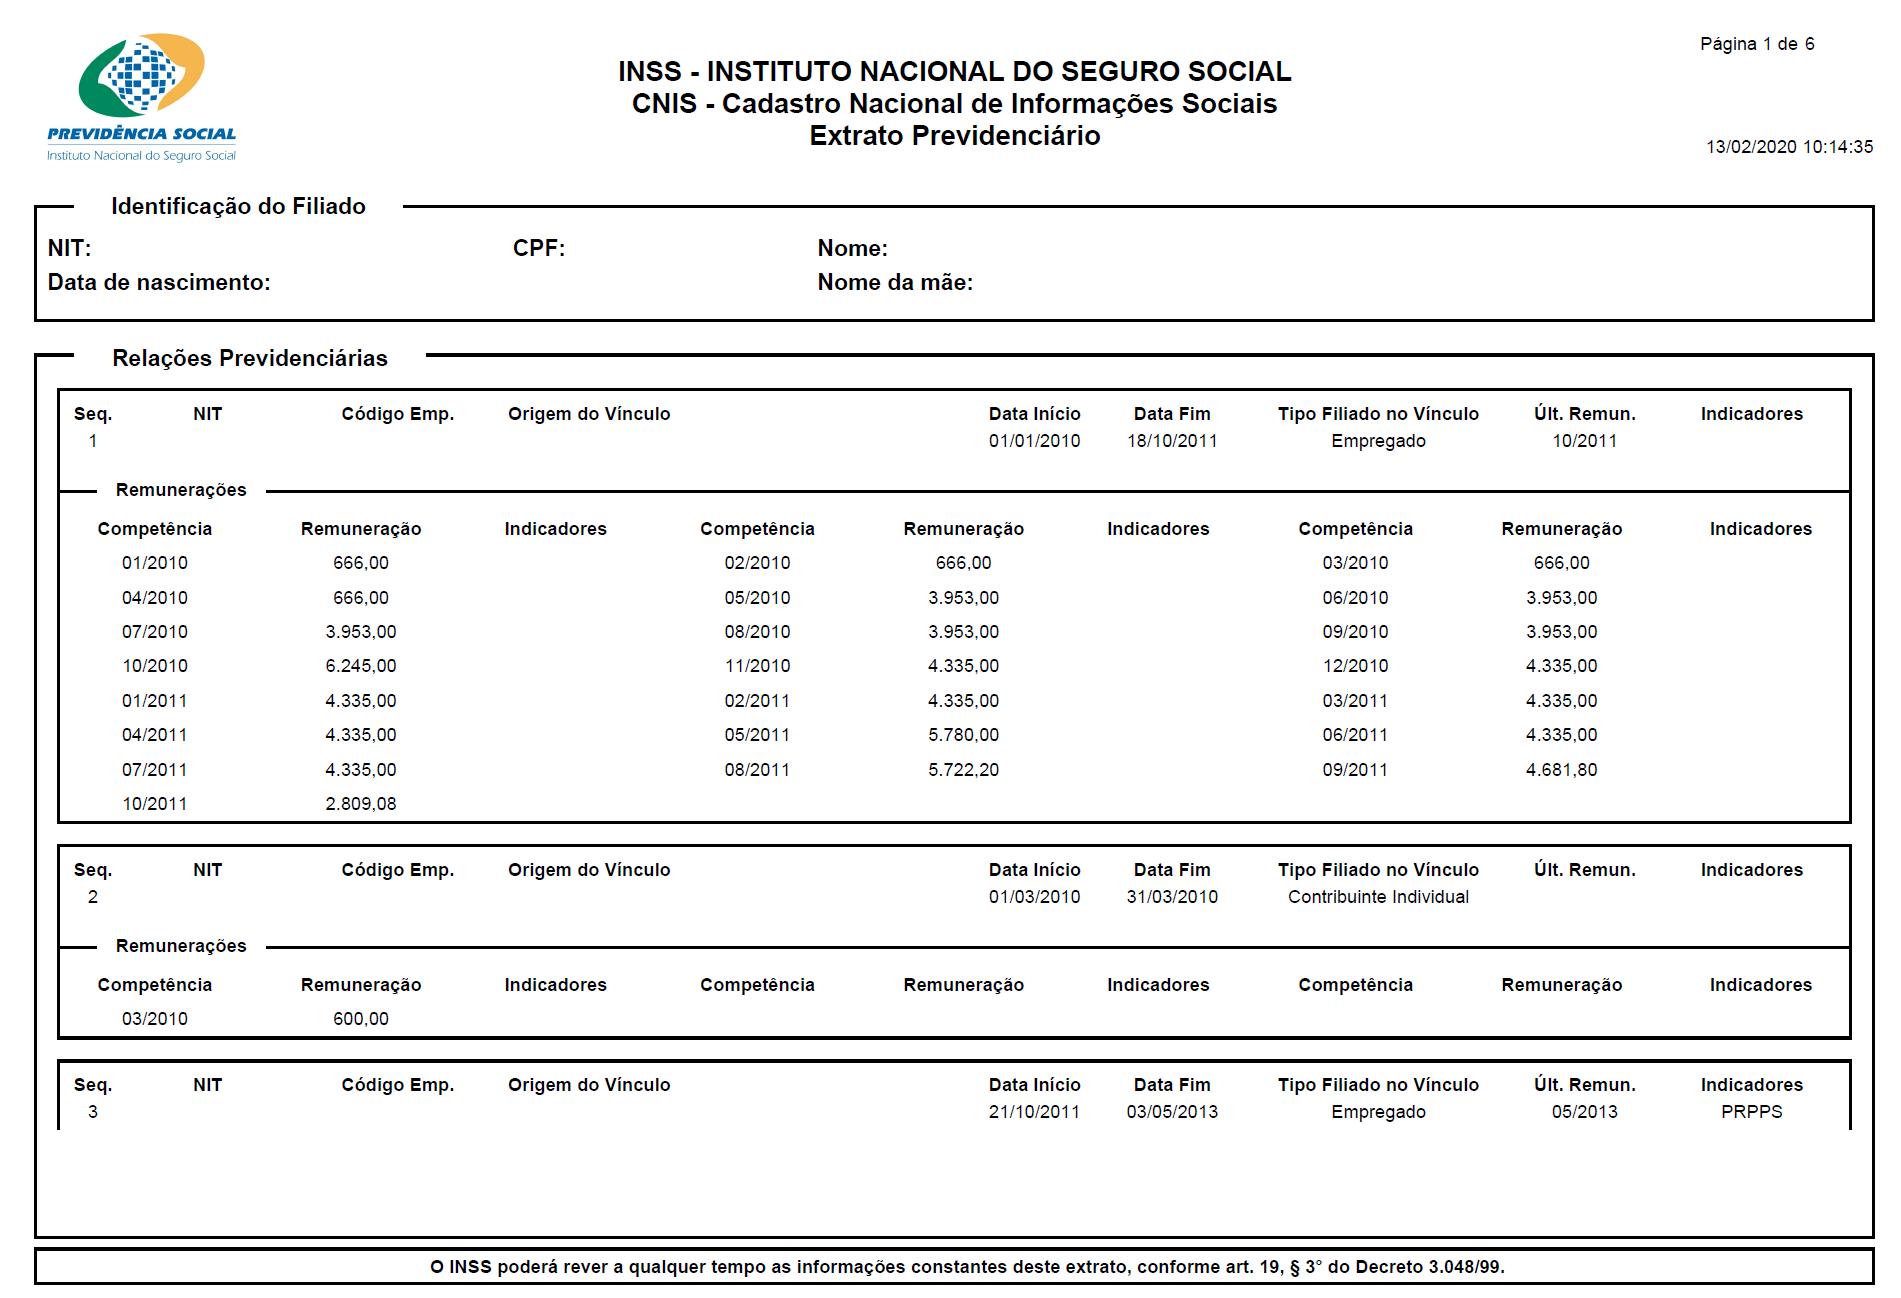 cnis-inss-extrato-previdenciario-exemplo